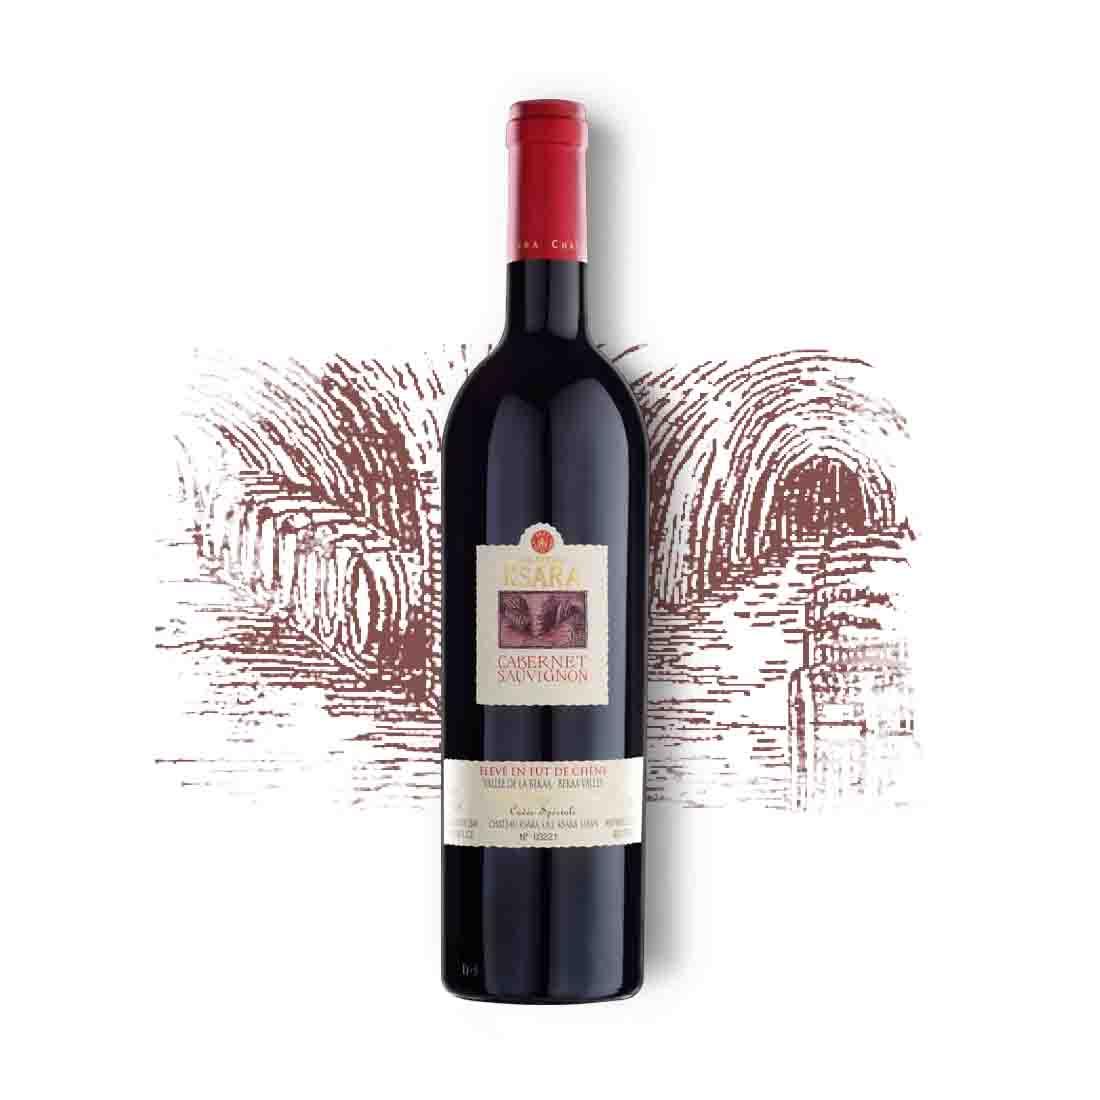 Chateau ksara collectible vintage aging rare Lebanese red wine cabernet sauvignon bekaa valley